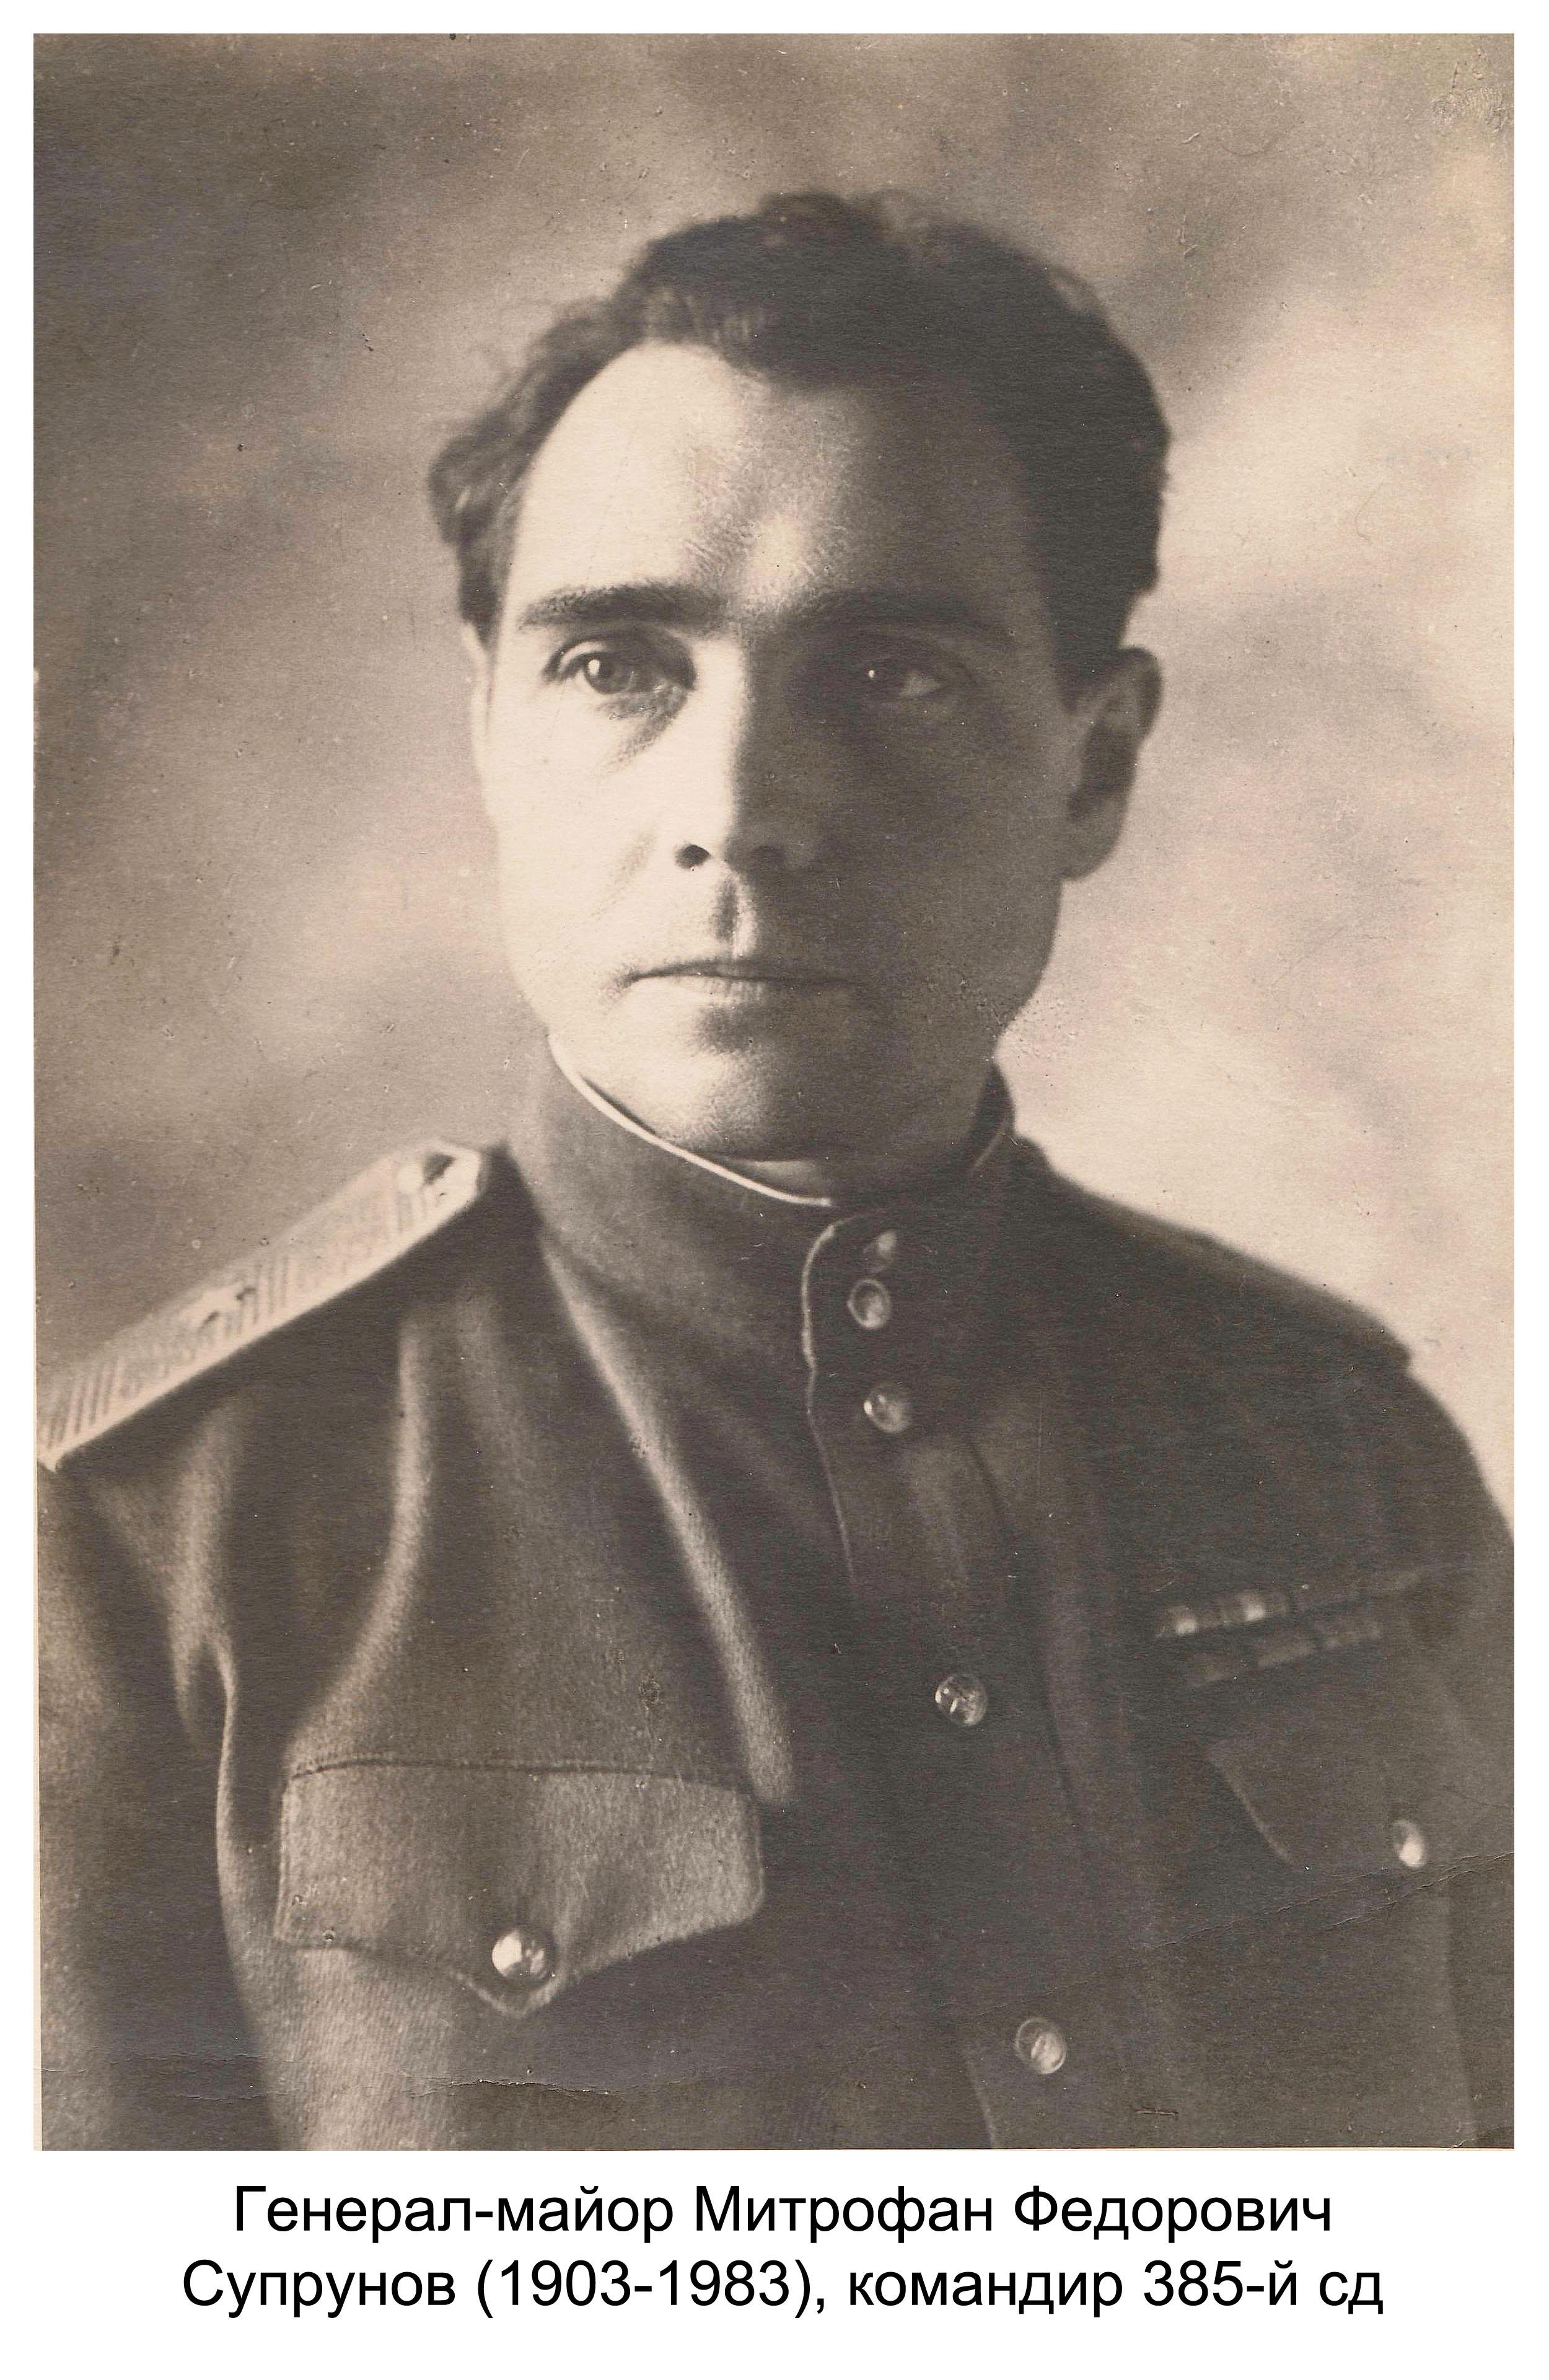 General_Suprunov_Mitrofan_Fedorovich